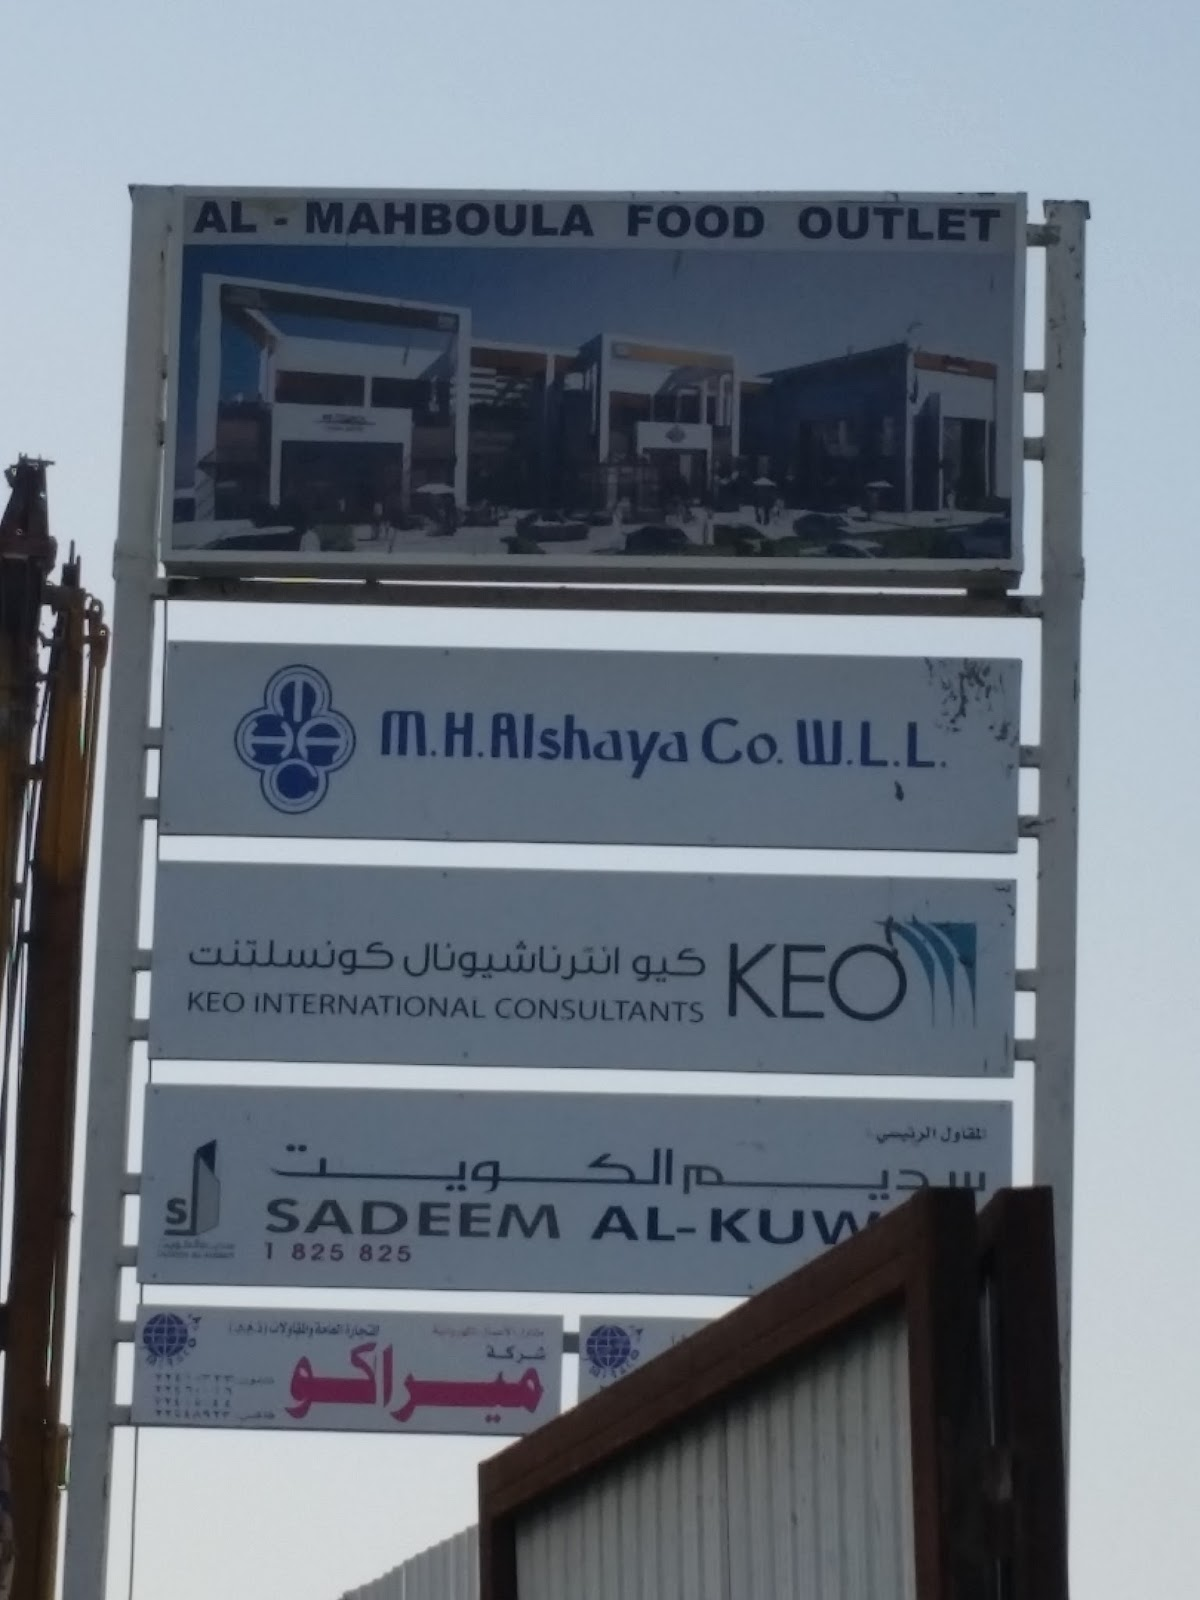 title>Al Mahboula Land from Al Shaya | Life in Kuwait